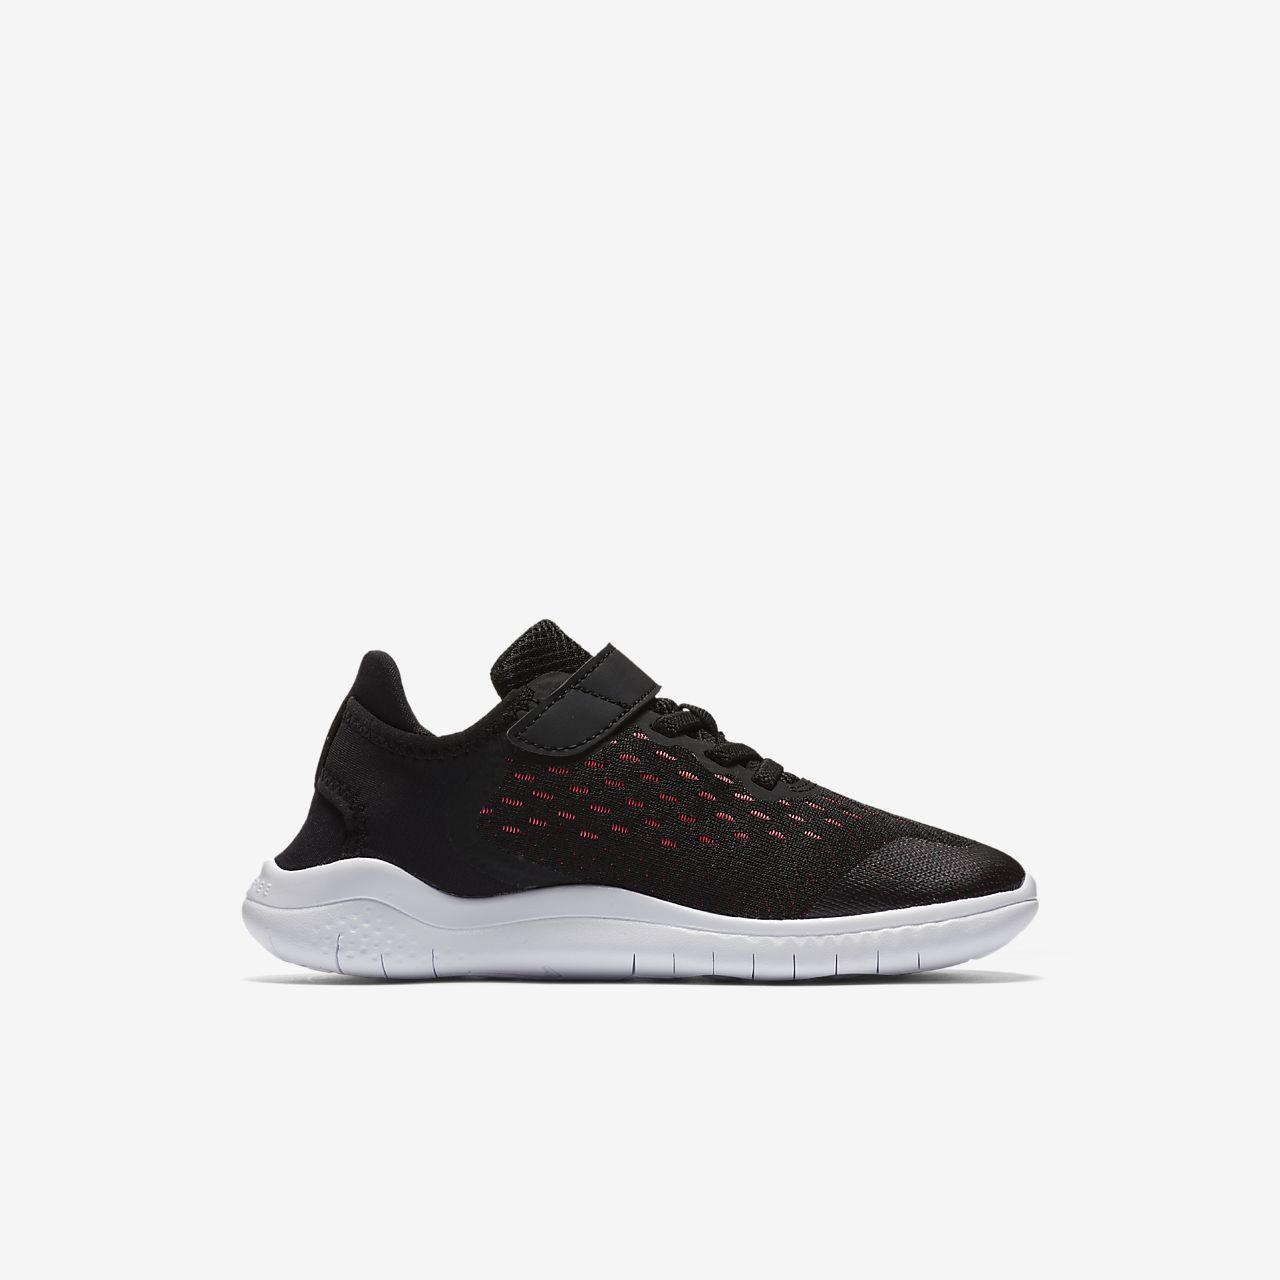 Calzado para niños talla pequeña Nike Free RN 2018. Nike.com MX